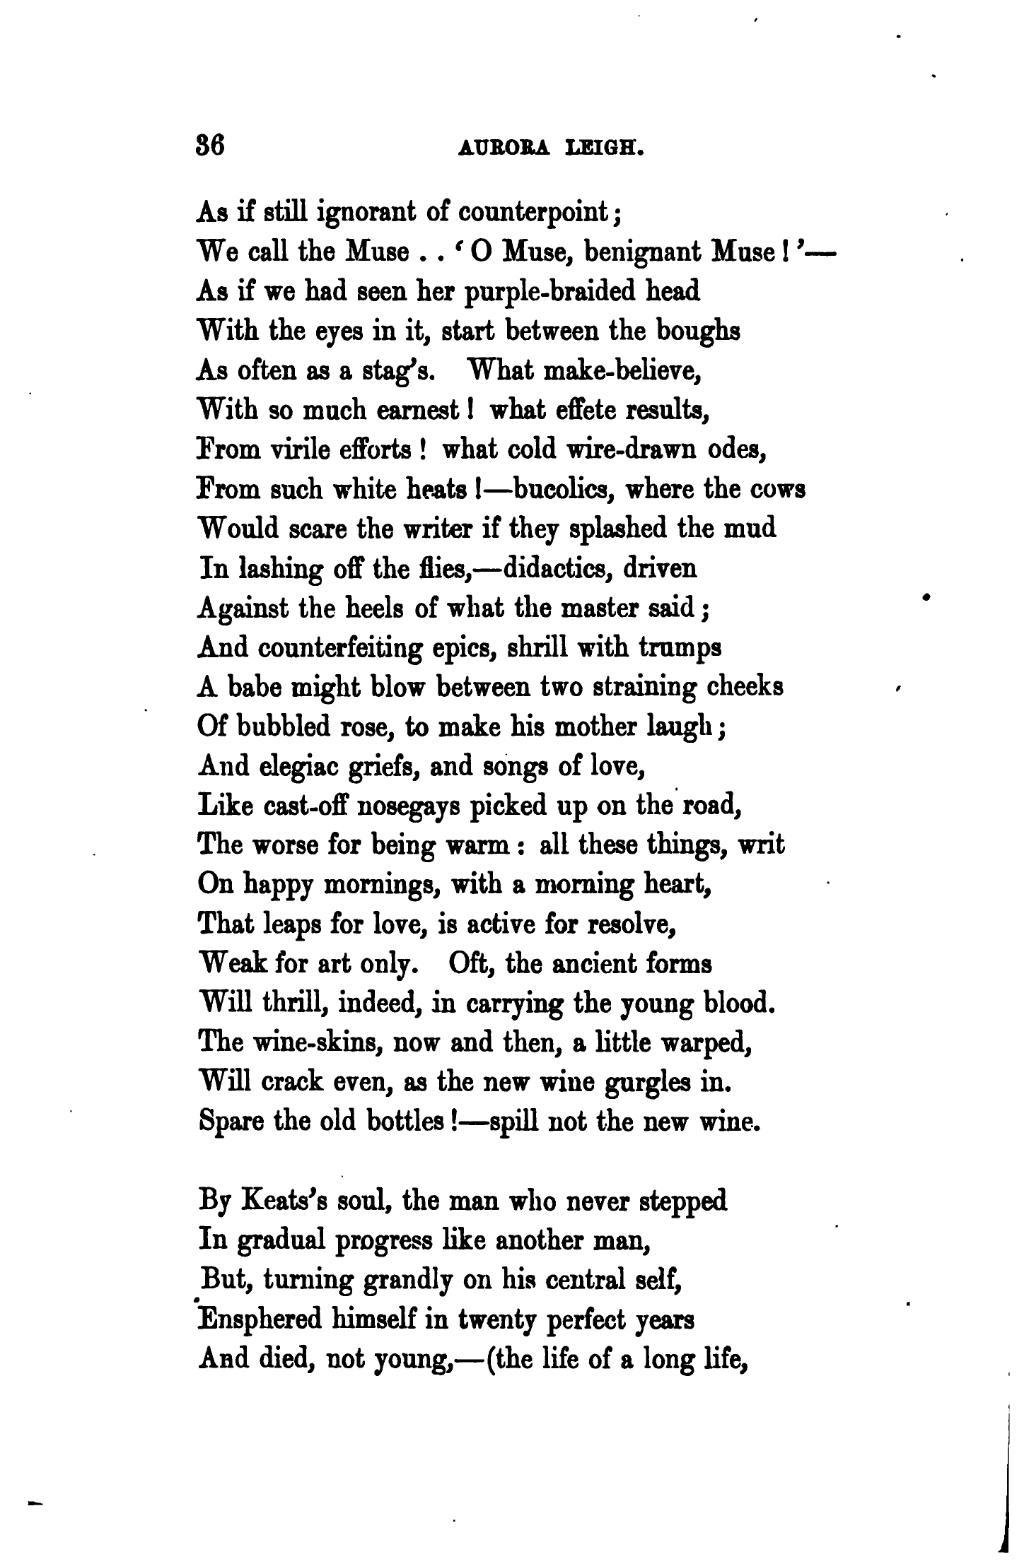 the perfect man poem